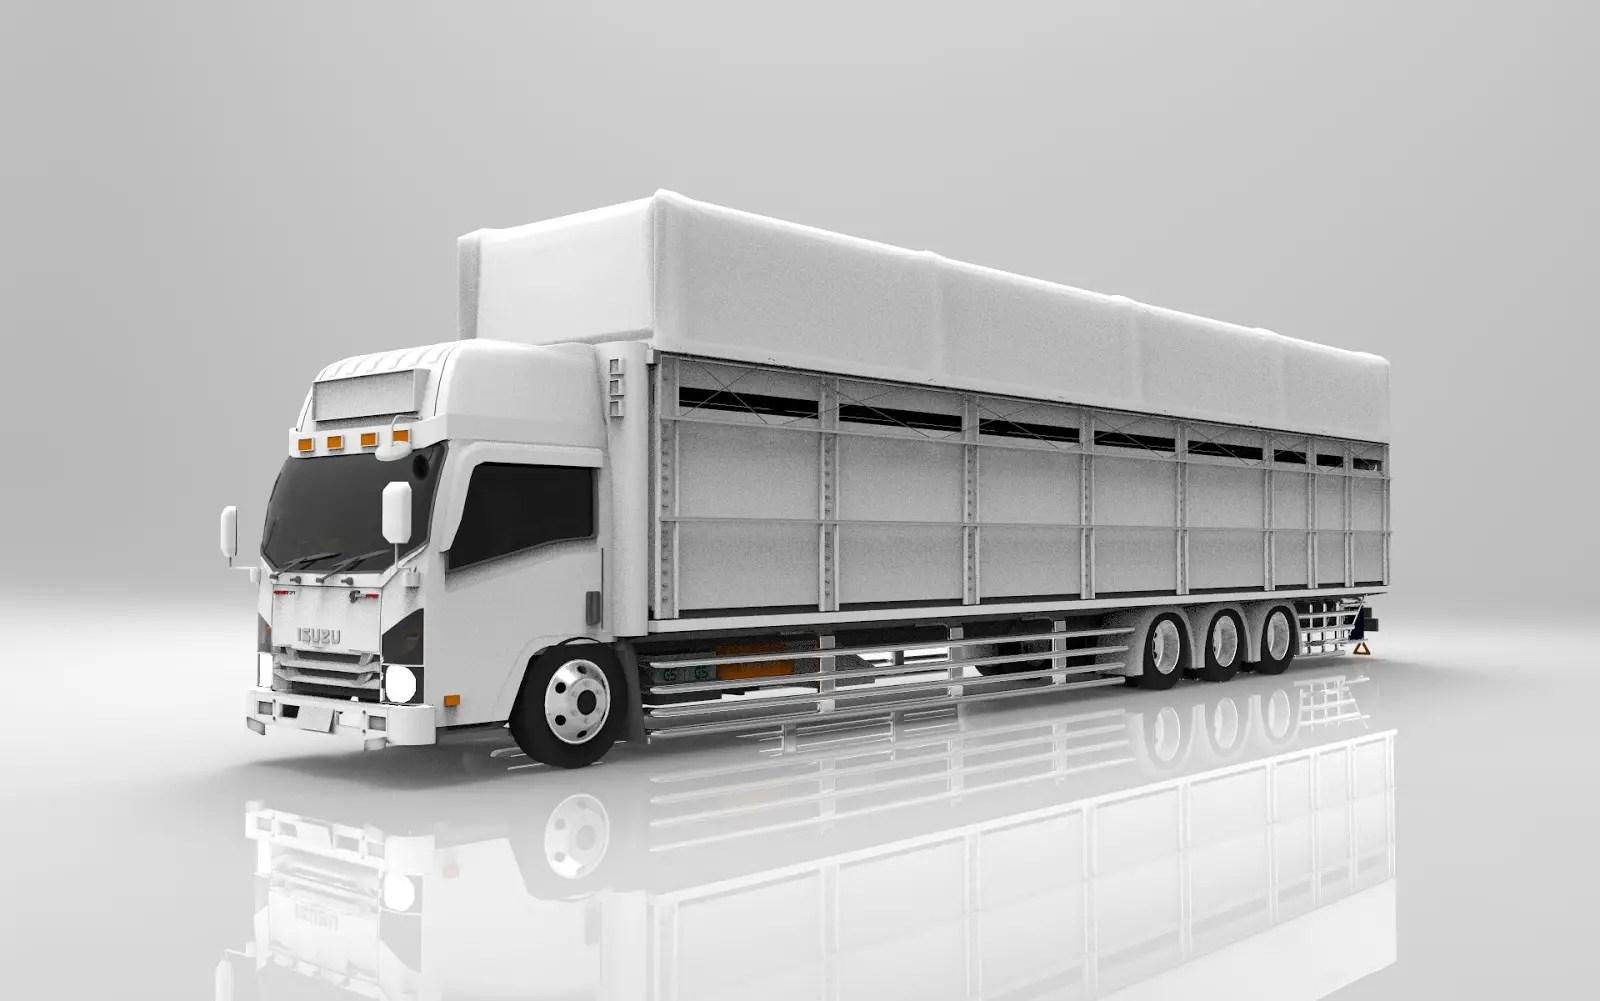 Download ISUZU NMR TRIBAL Mod for Bus Simulator Indonesia, ISUZU NMR TRIBAL, BUSSID mod, ISUZU NMR TRIBAL, ISUZU NMR Truck Mod, SGCArena, Vehicle Mod, WSPMods